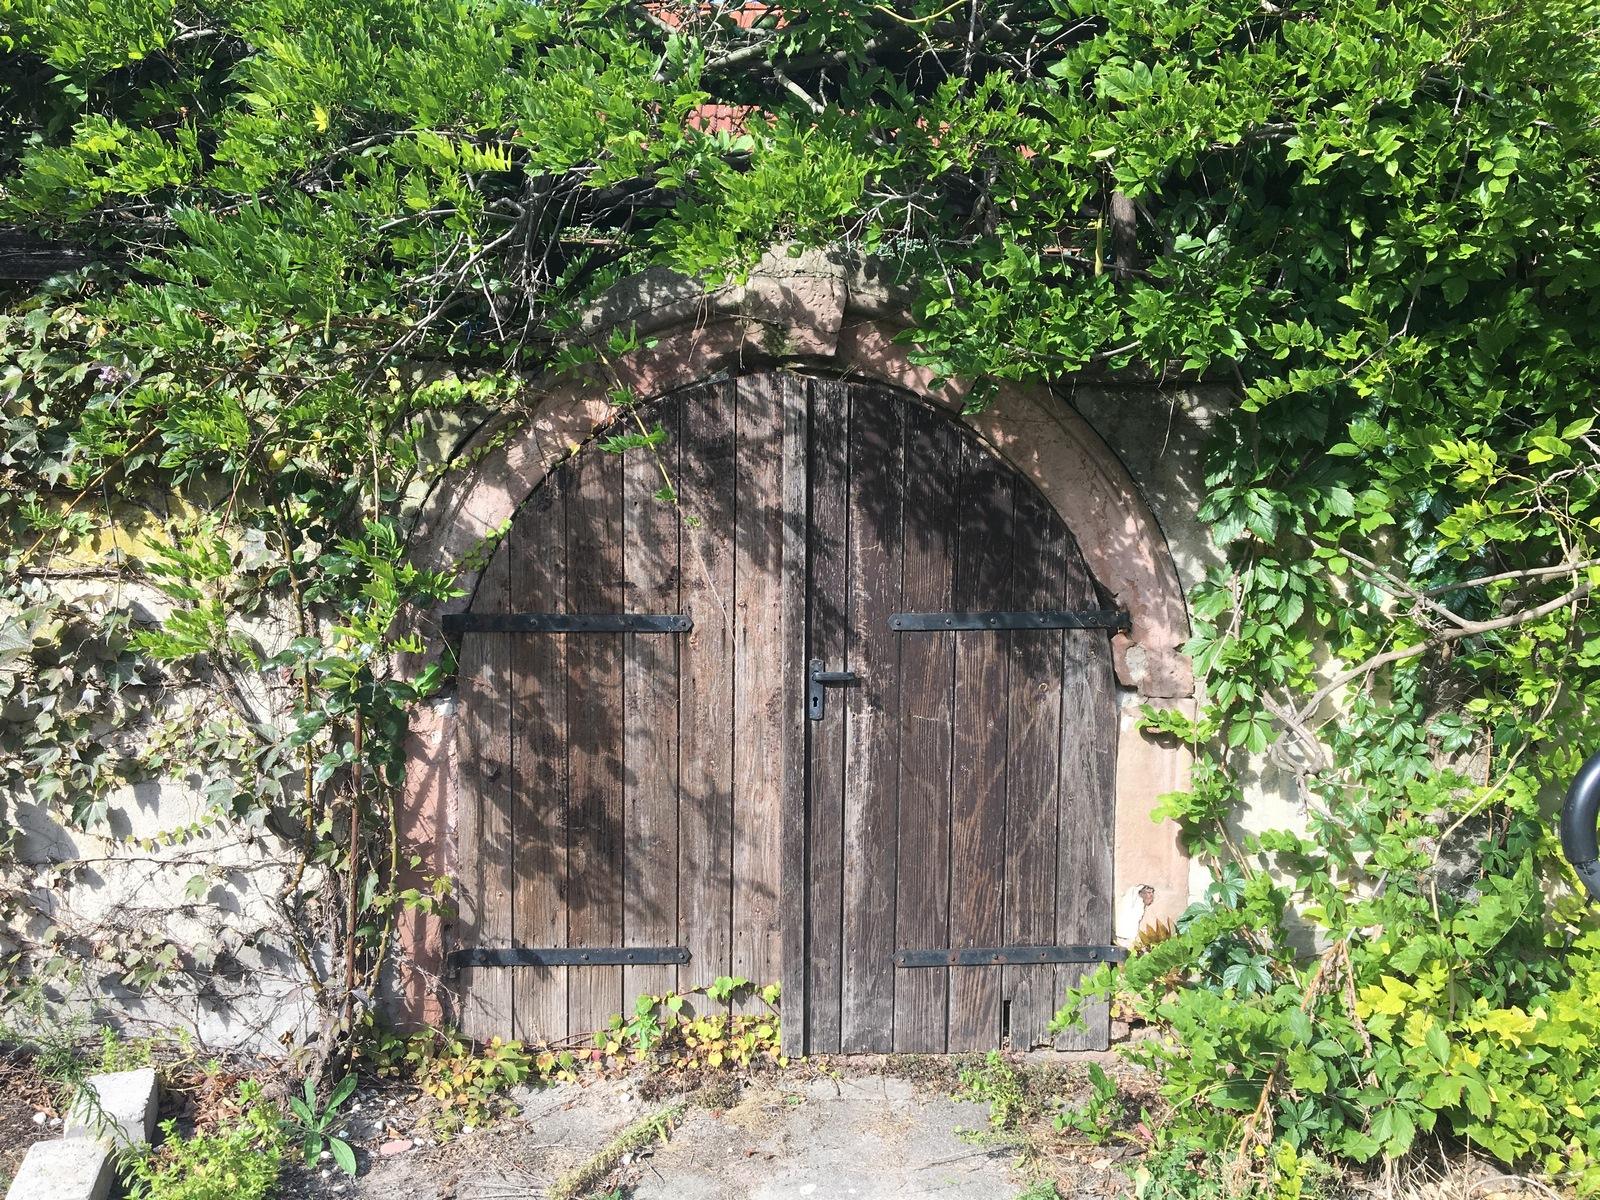 Kellereingang im Dornröschenschlaf